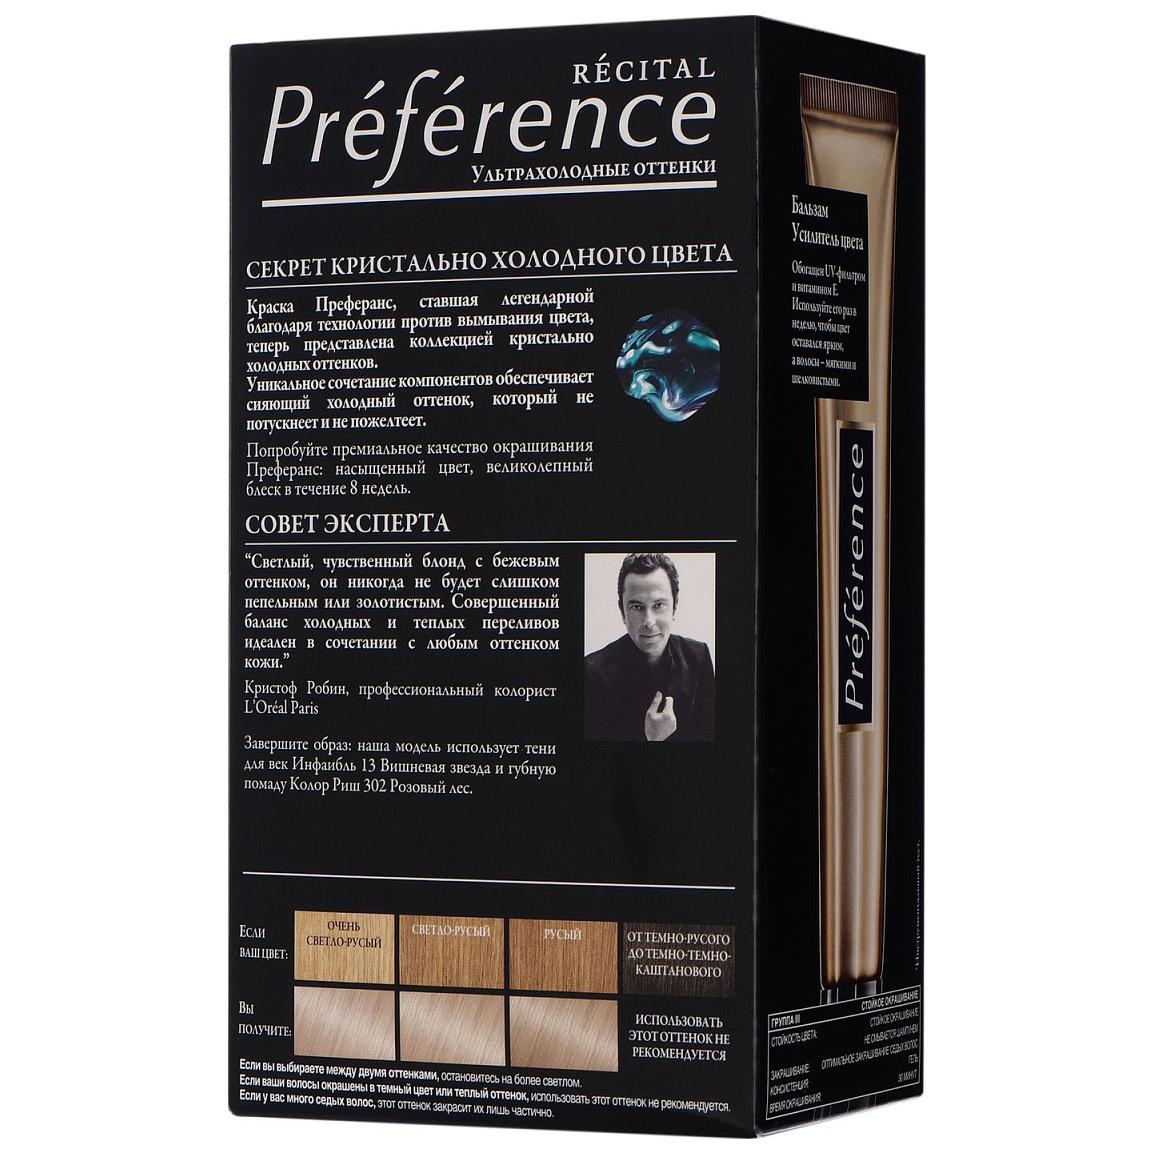 Миниатюра Краска для волос L'Oreal Paris Preference тон 9,13 Байкал 40мл №2